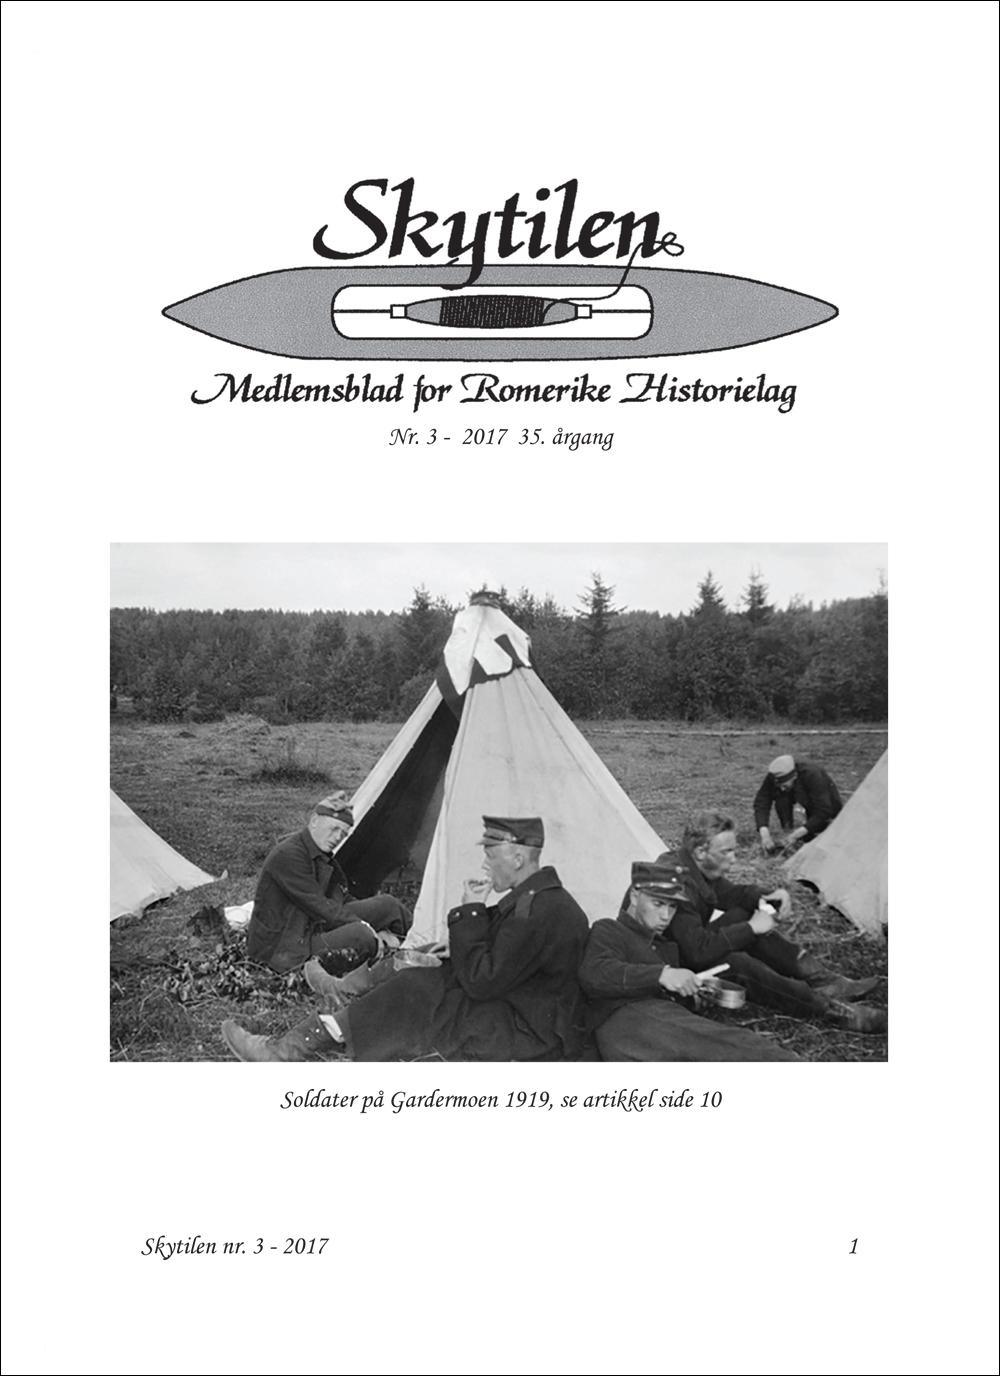 2017_skytilen-nr3.jpg